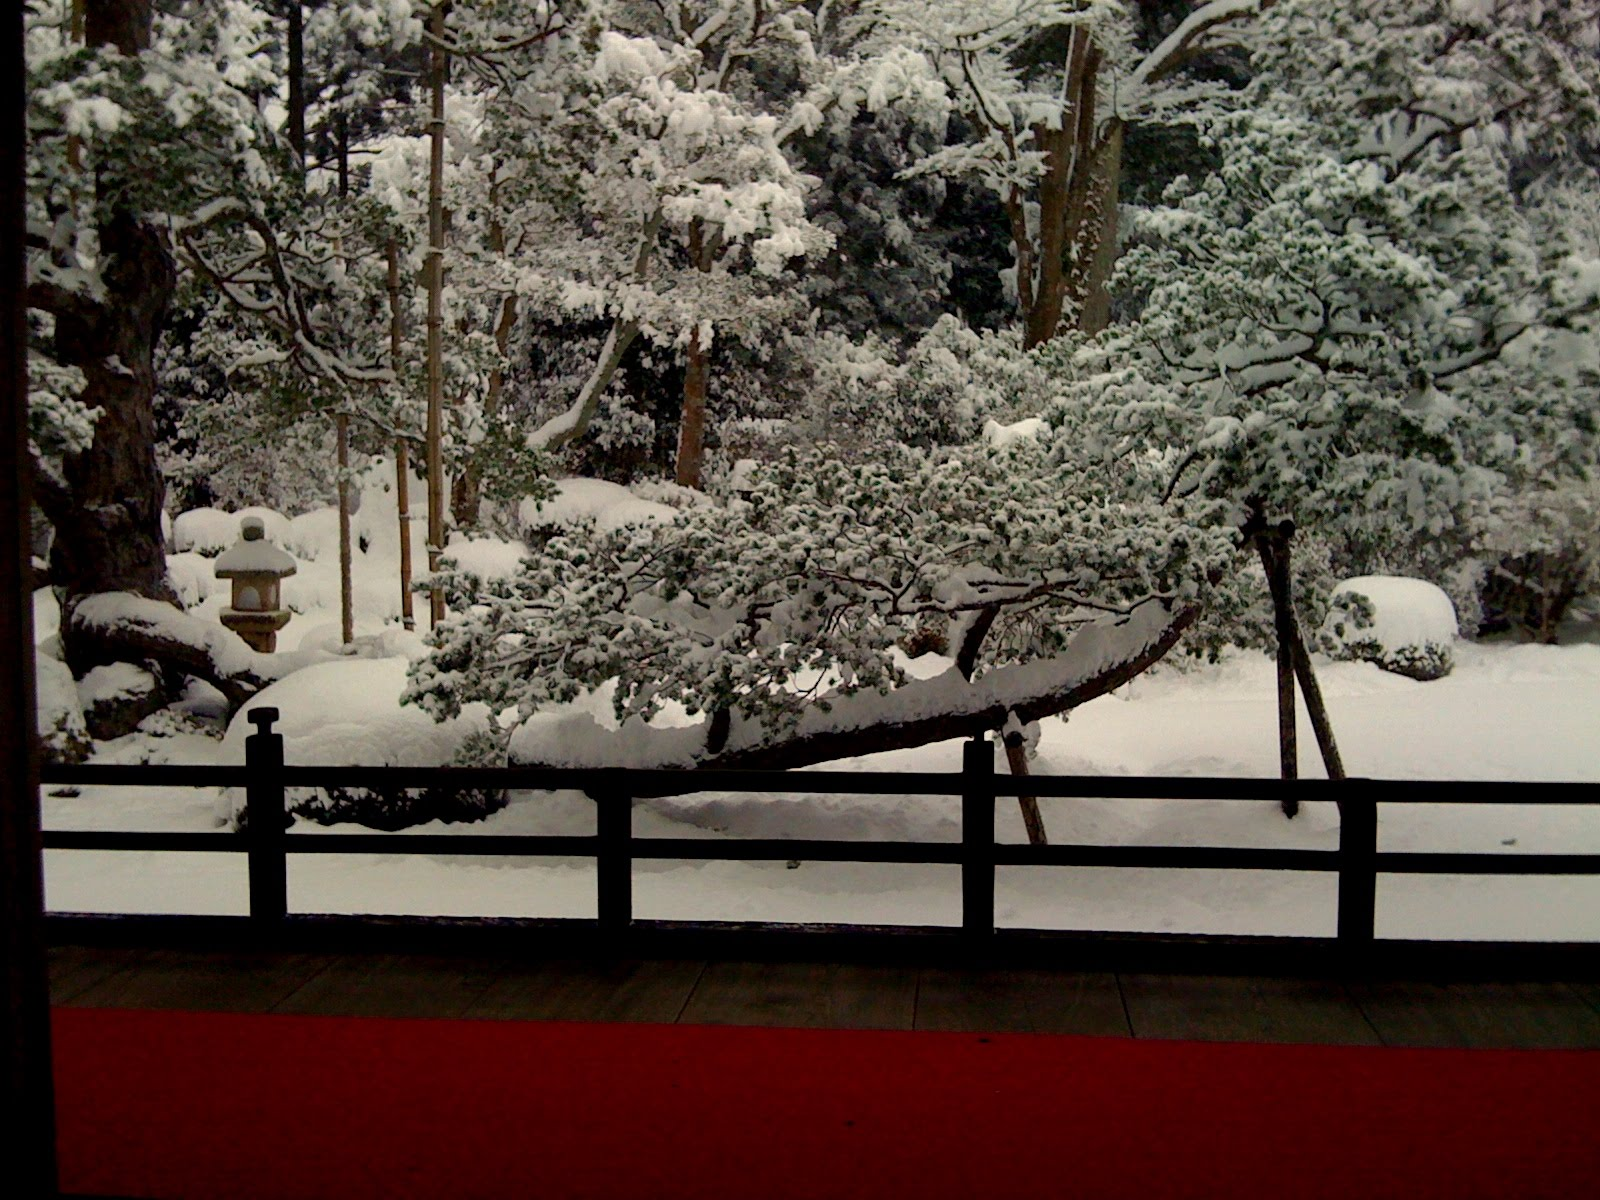 nebula kyoto in winter. Black Bedroom Furniture Sets. Home Design Ideas